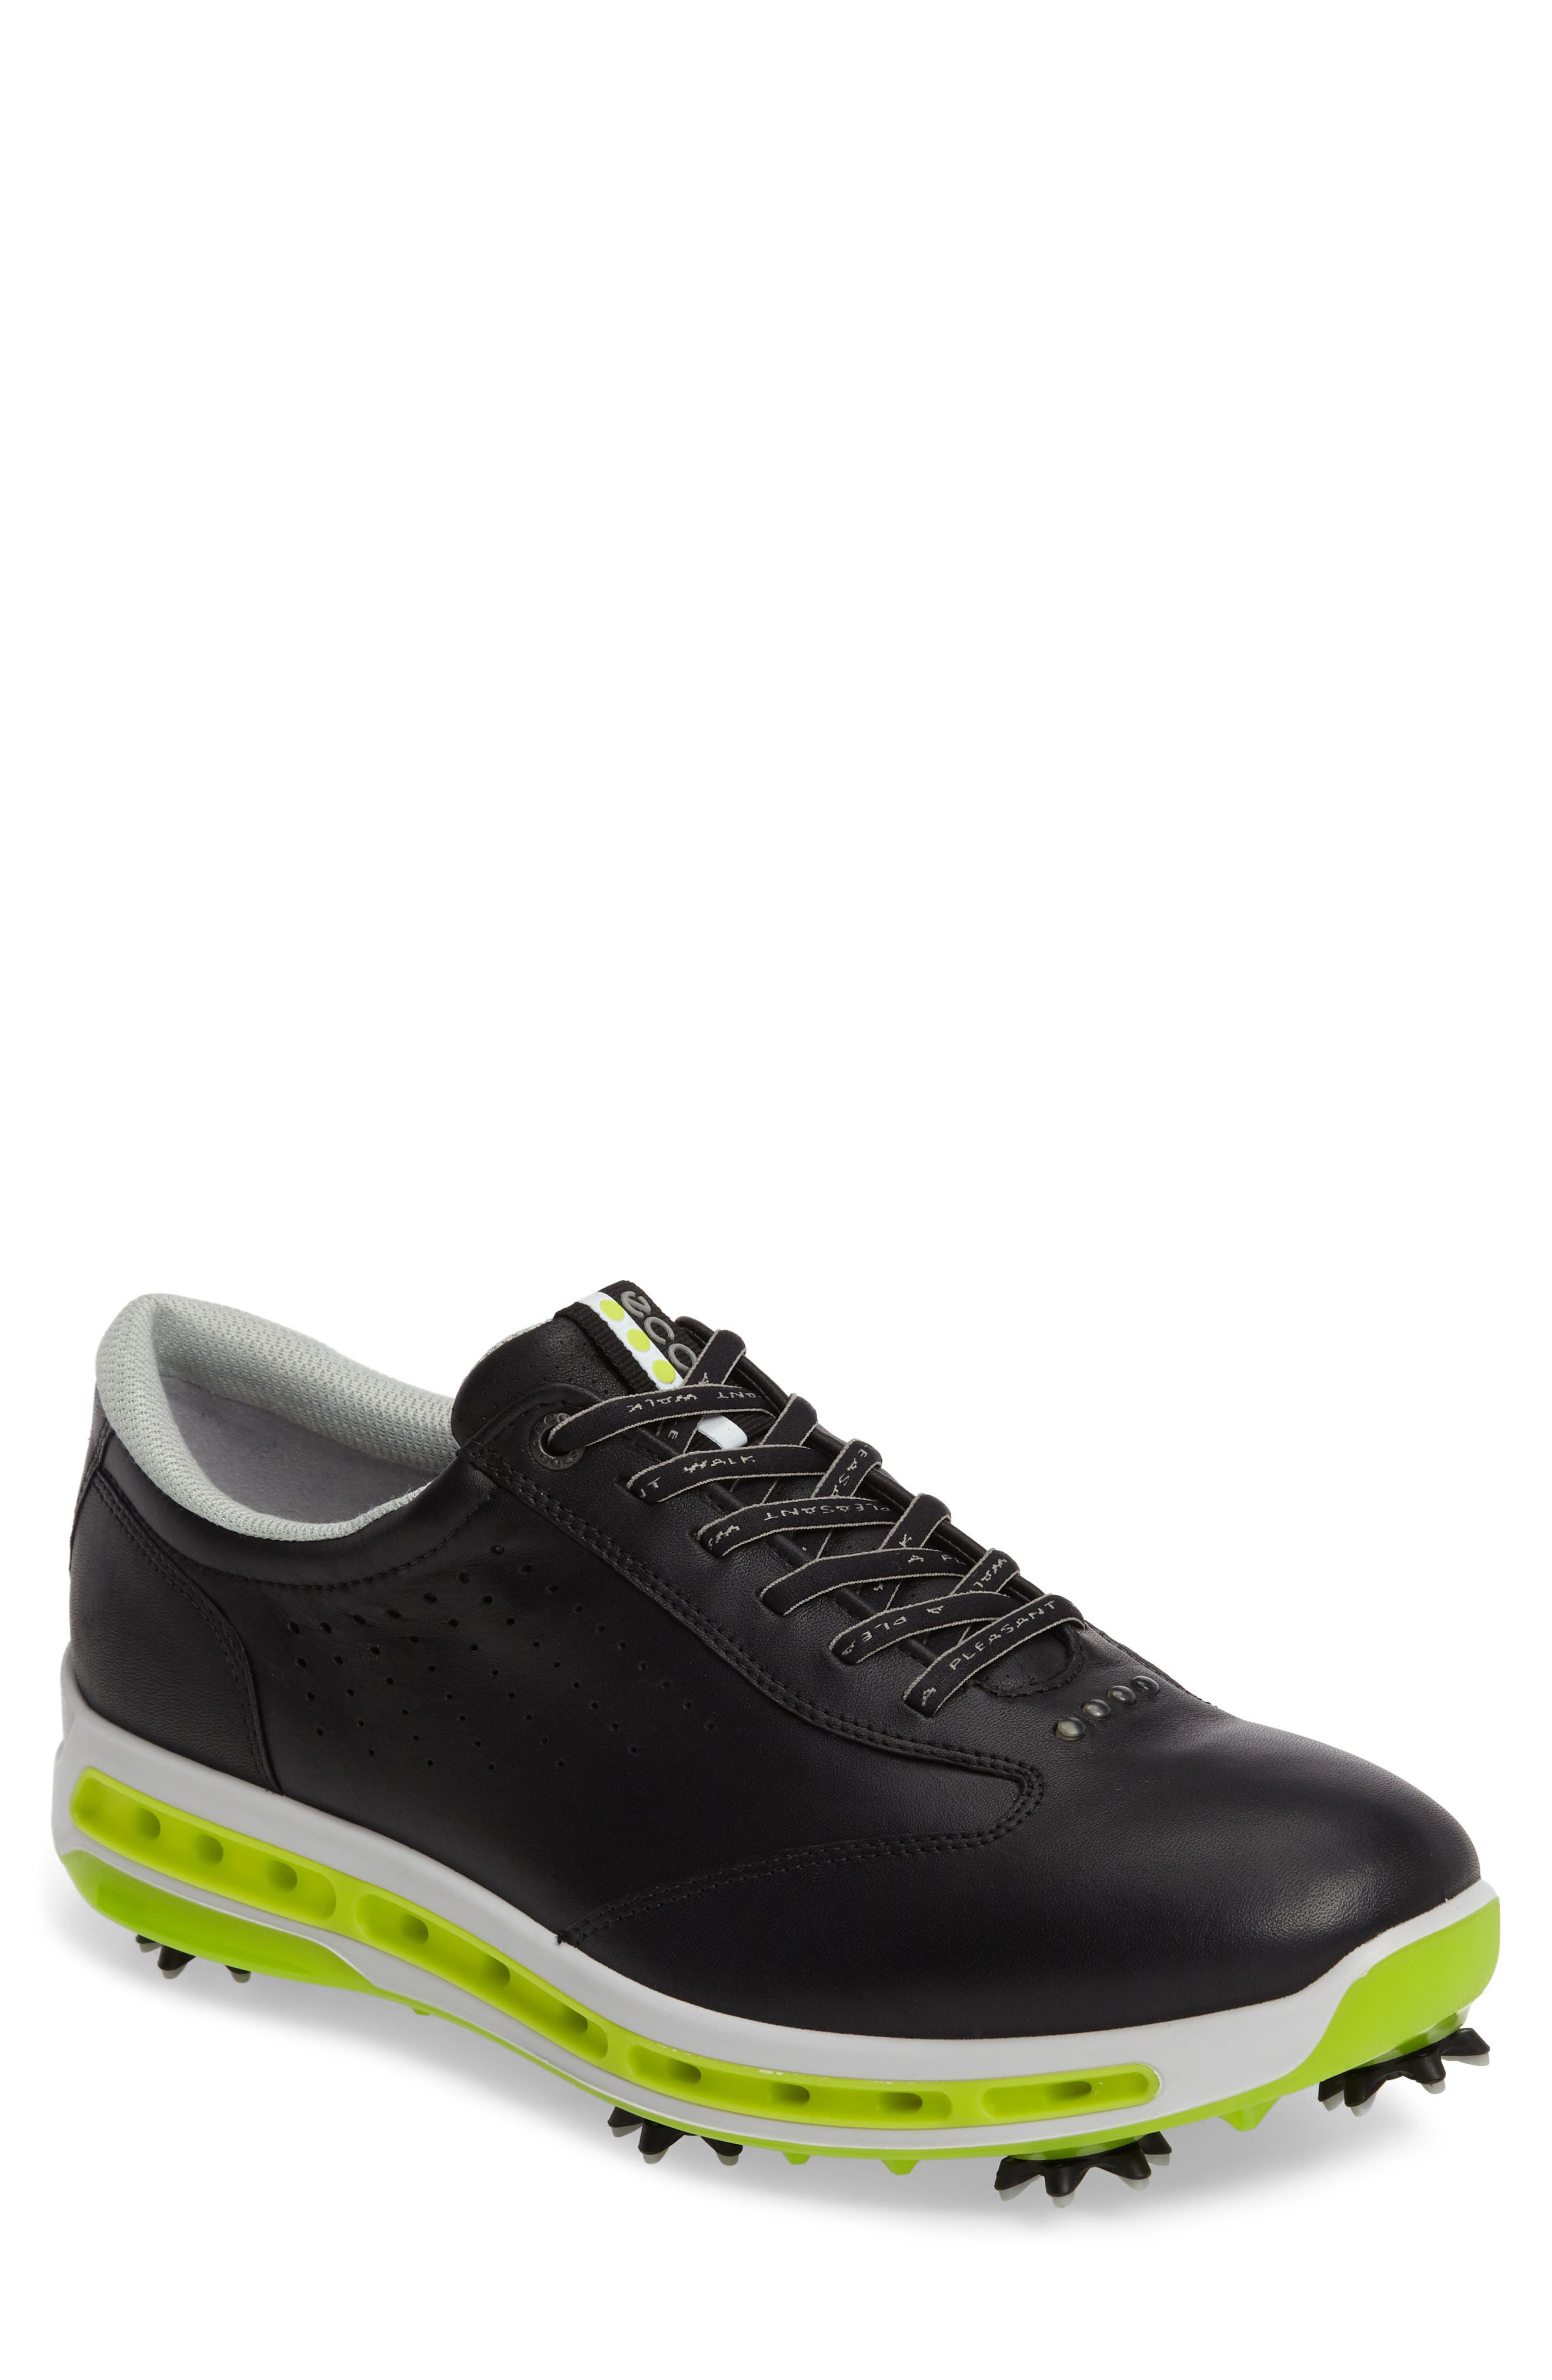 Cool GTX Golf Shoe,                             Main thumbnail 1, color,                             001